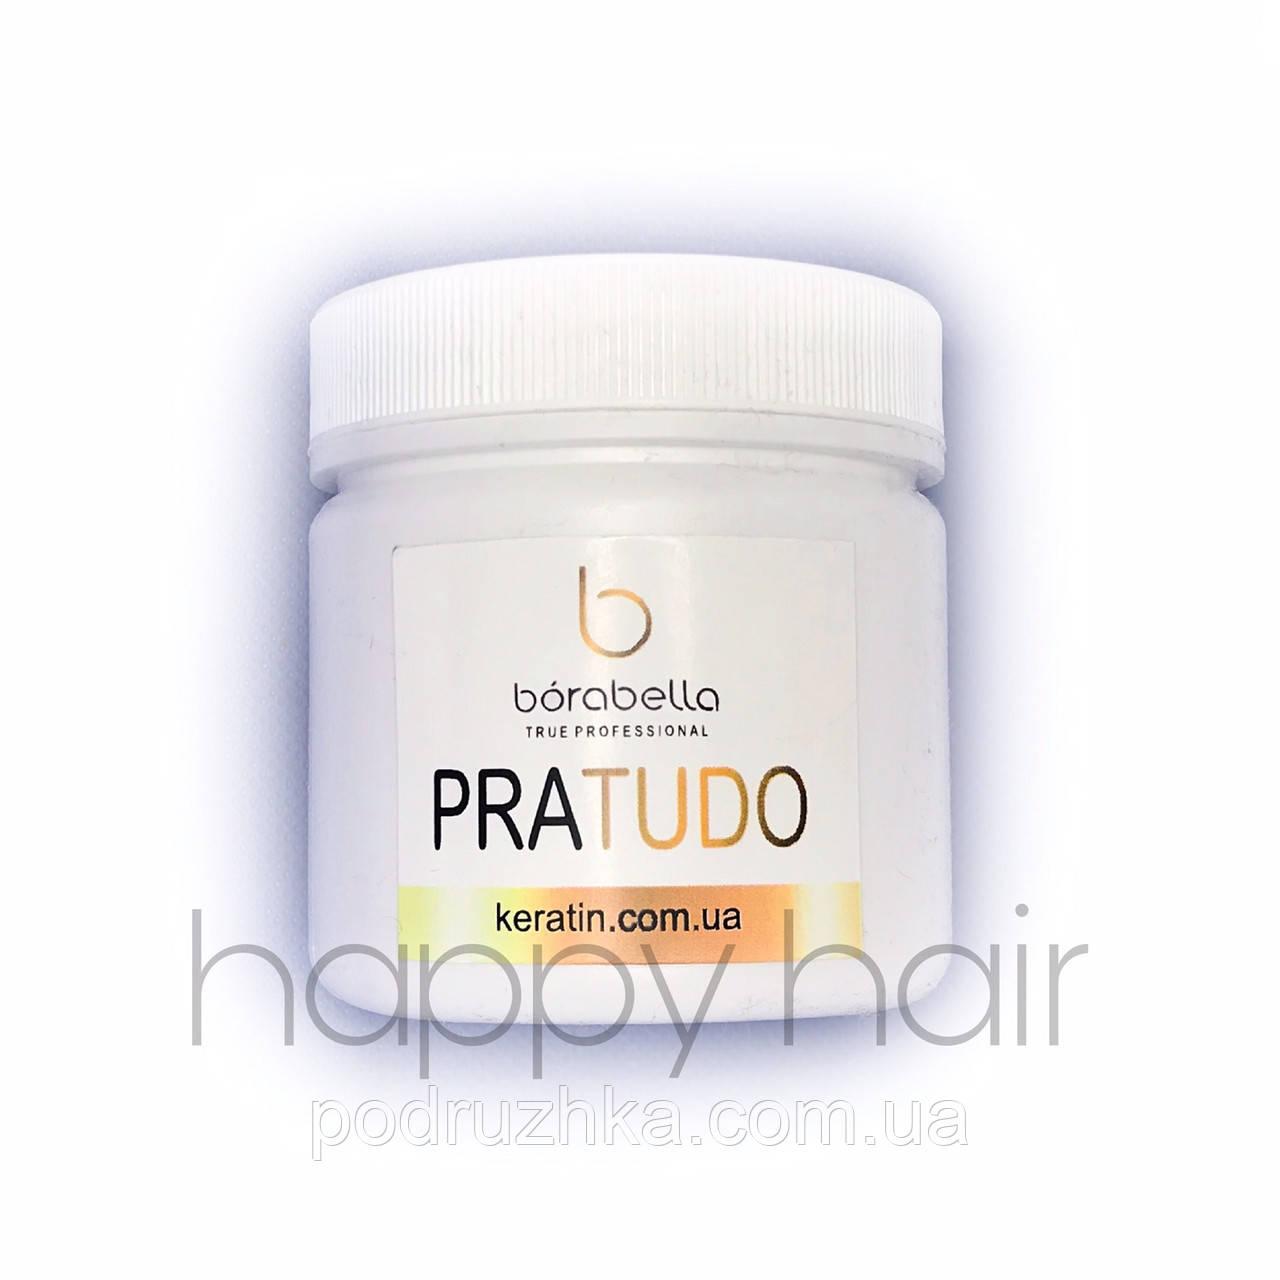 Borabella Pra Tudo Cronograma Capilar ботекс для волос 100 г